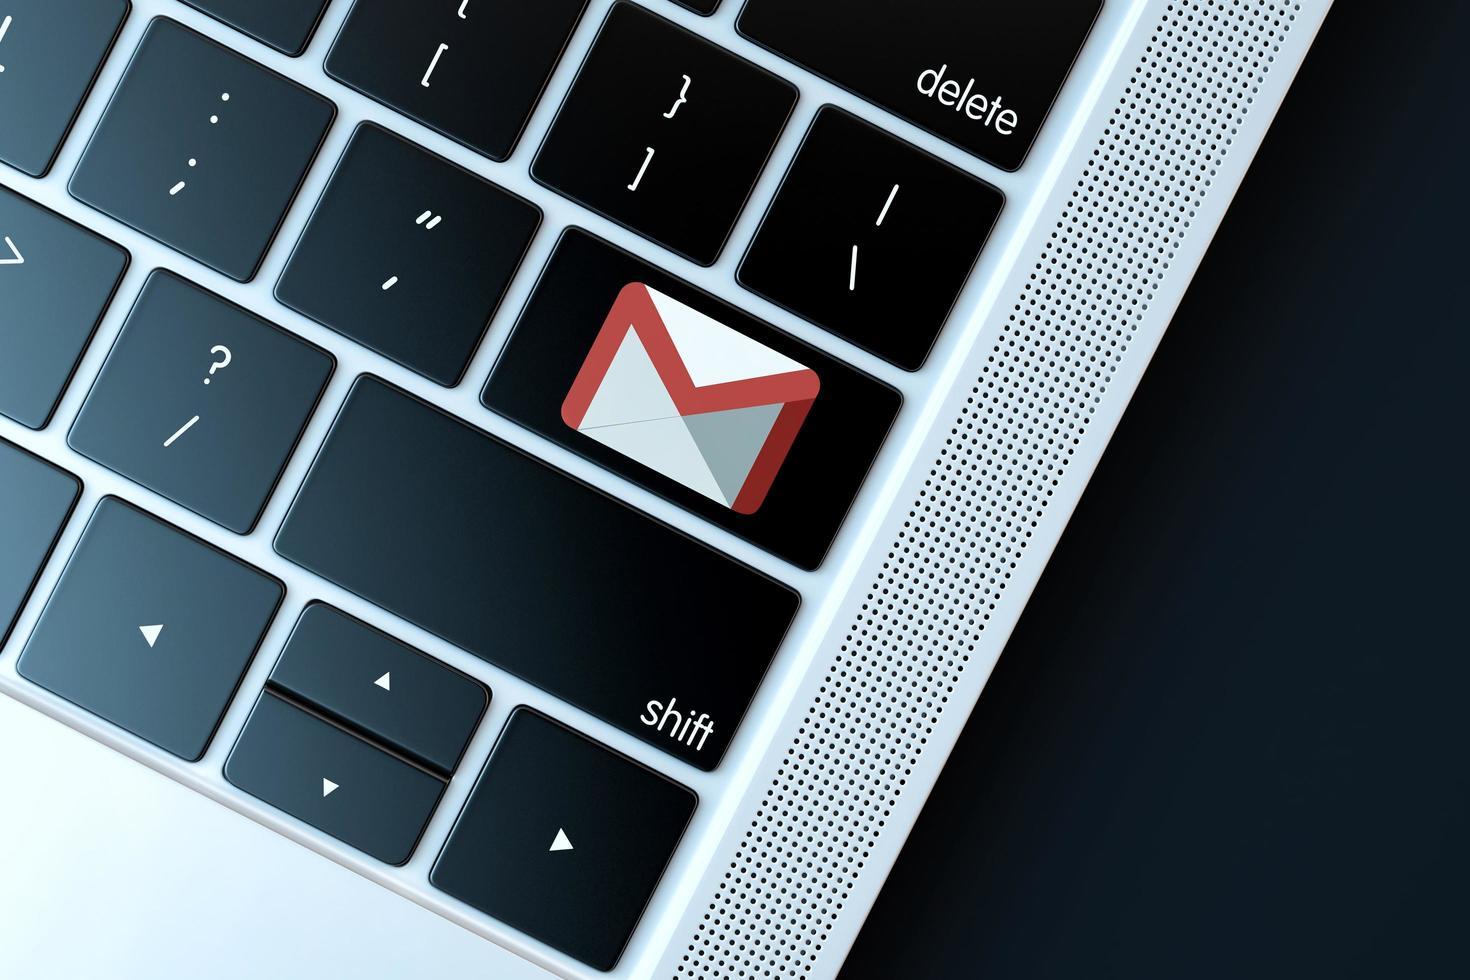 Gmail icon on laptop keyboard photo